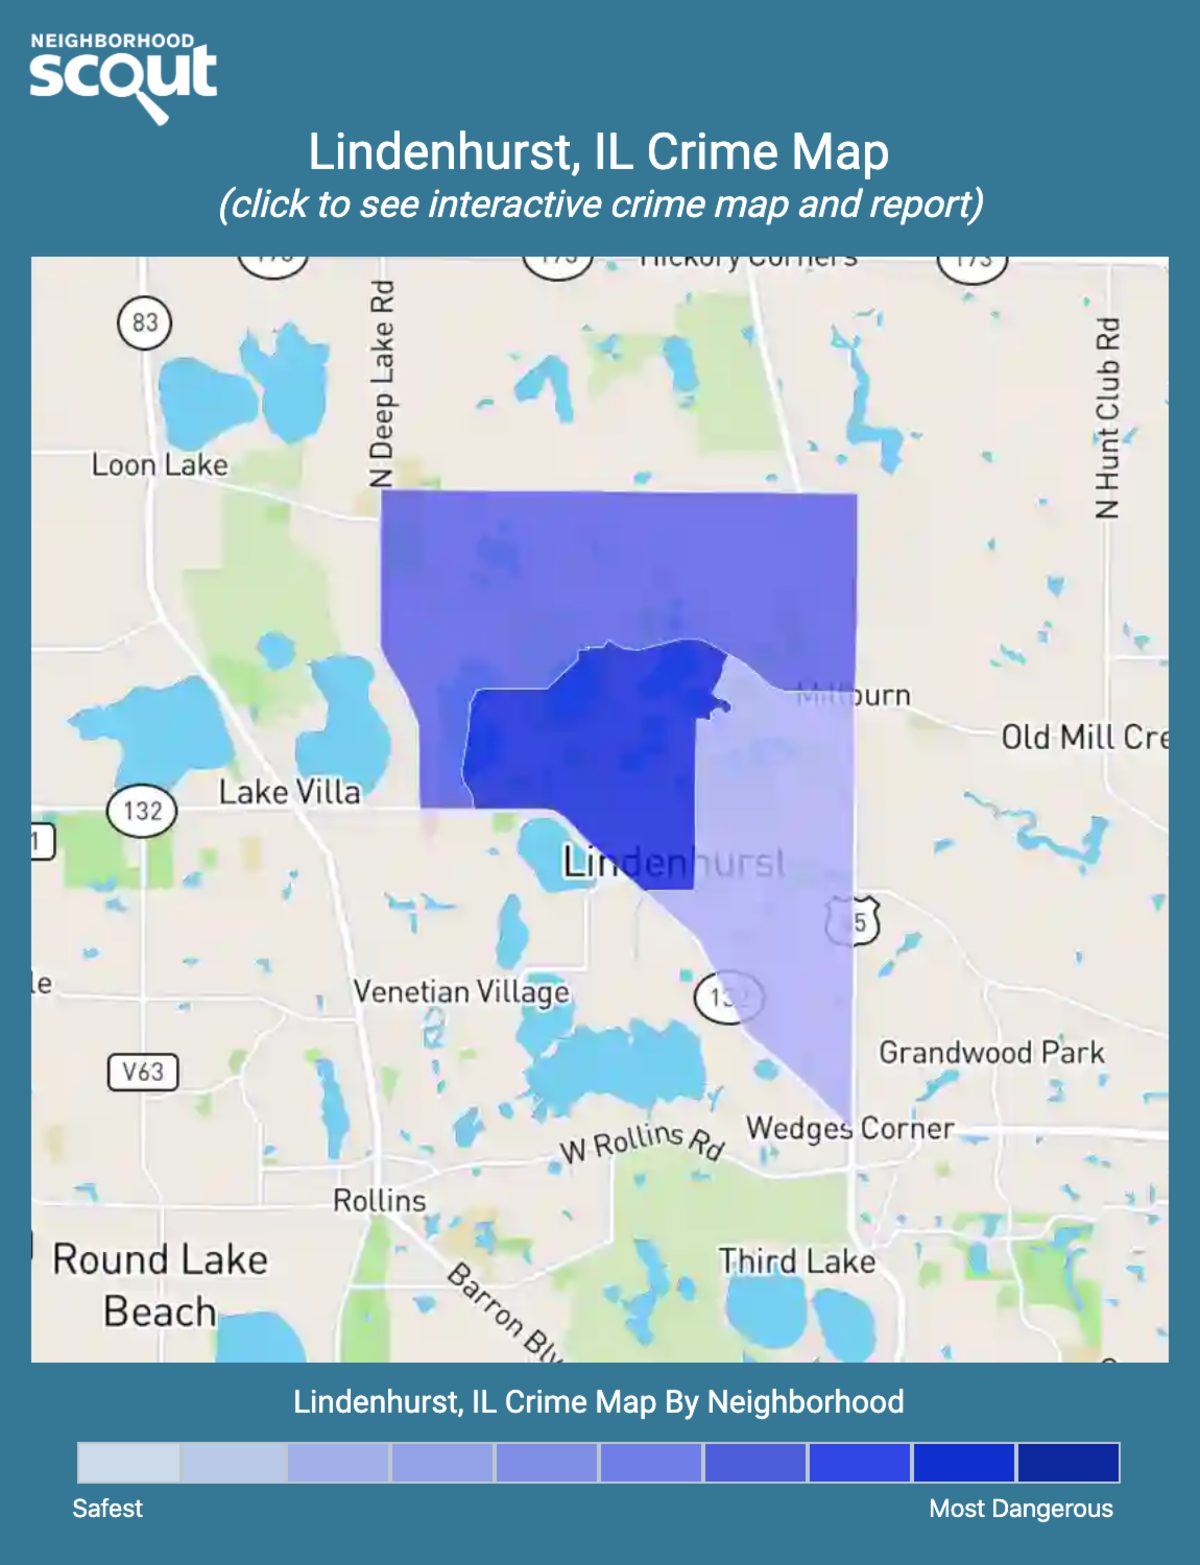 Lindenhurst, Illinois crime map